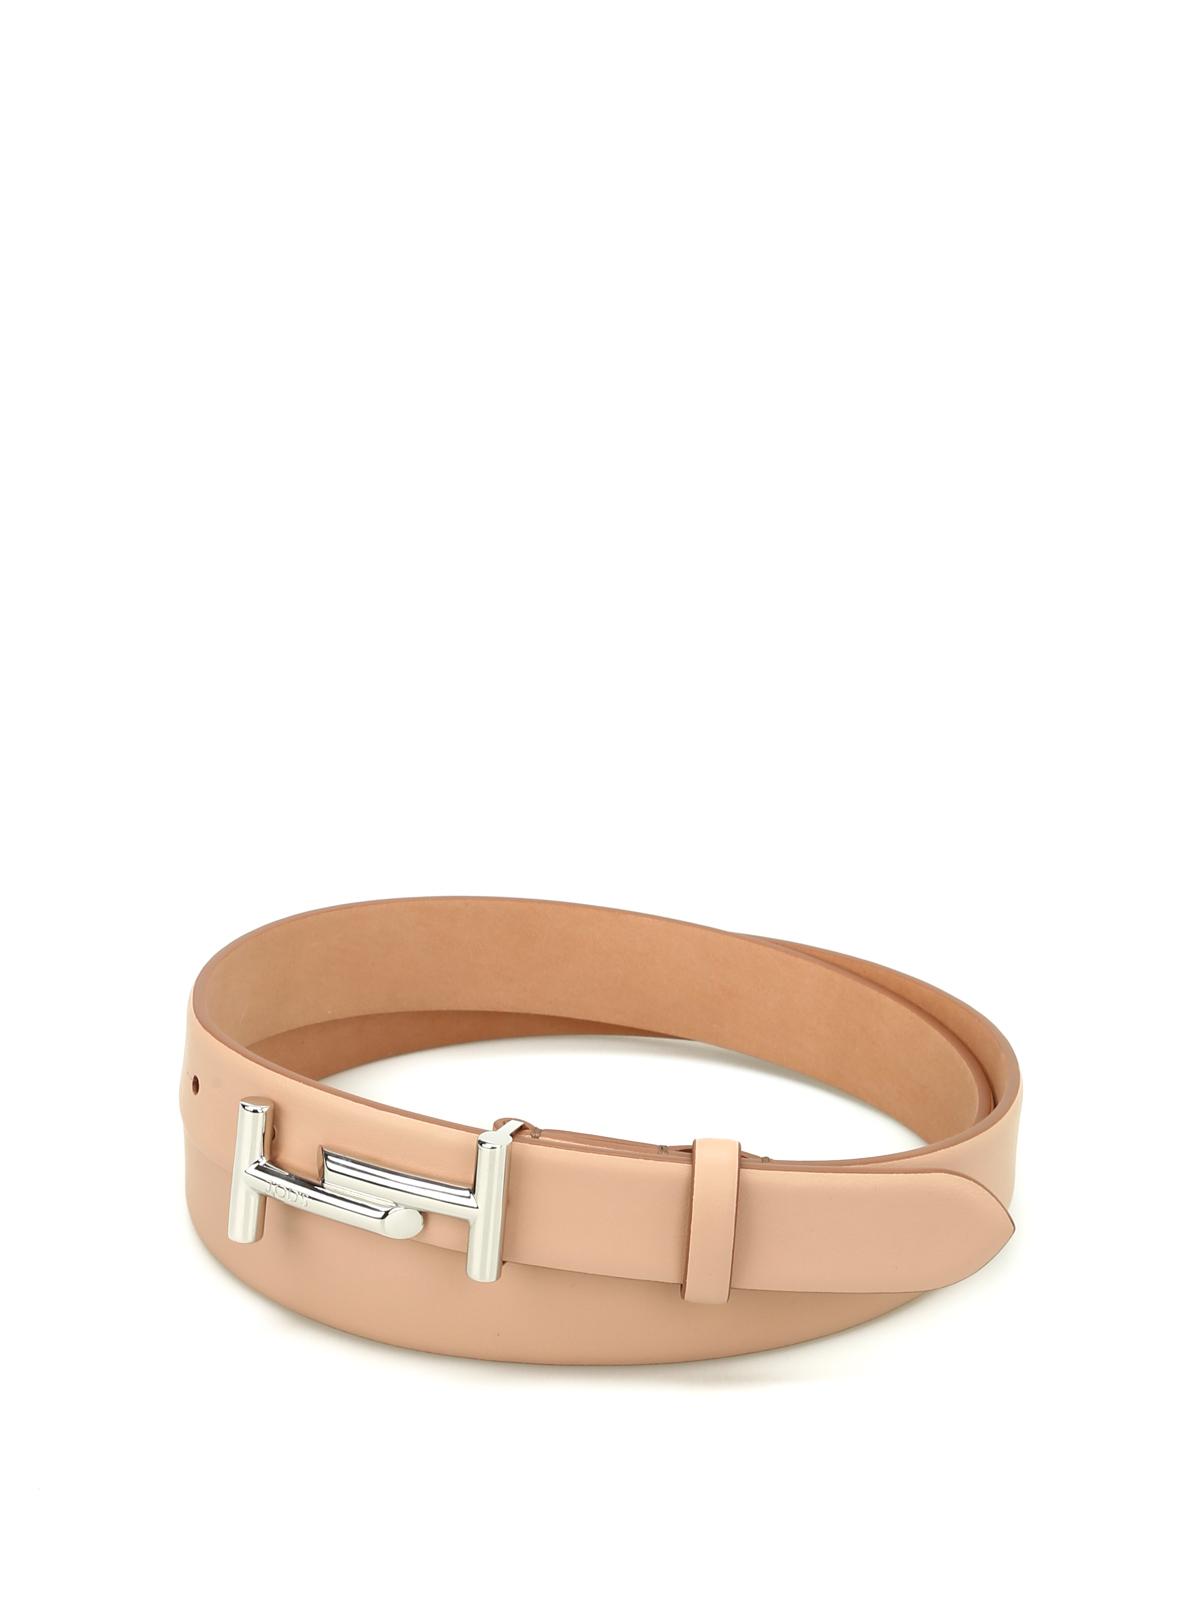 double t buckle leather belt by tod 39 s belts ikrix. Black Bedroom Furniture Sets. Home Design Ideas